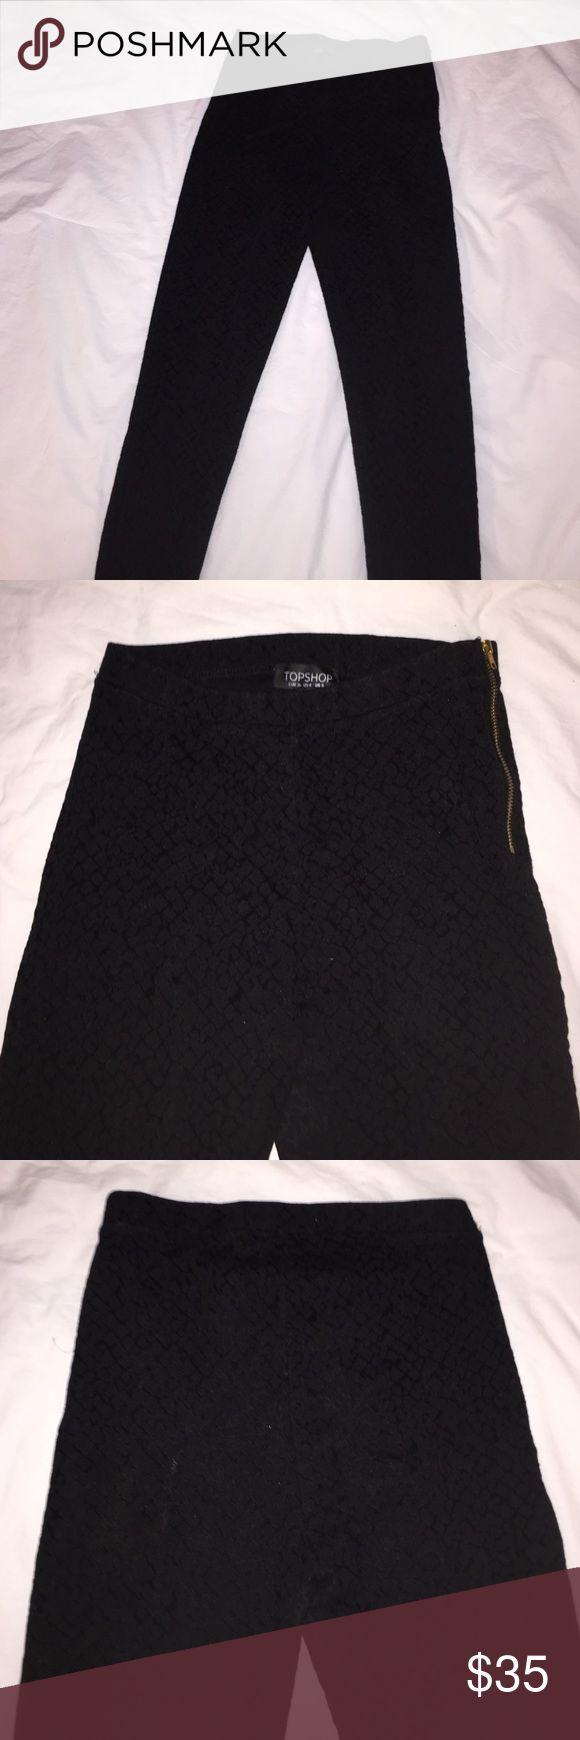 Topshop size 4, black textured leggings w/ zipper Black Topshop leggings with velvet patterned texture, gold zipper on left side, lightly worn, size 4 Topshop Pants Leggings